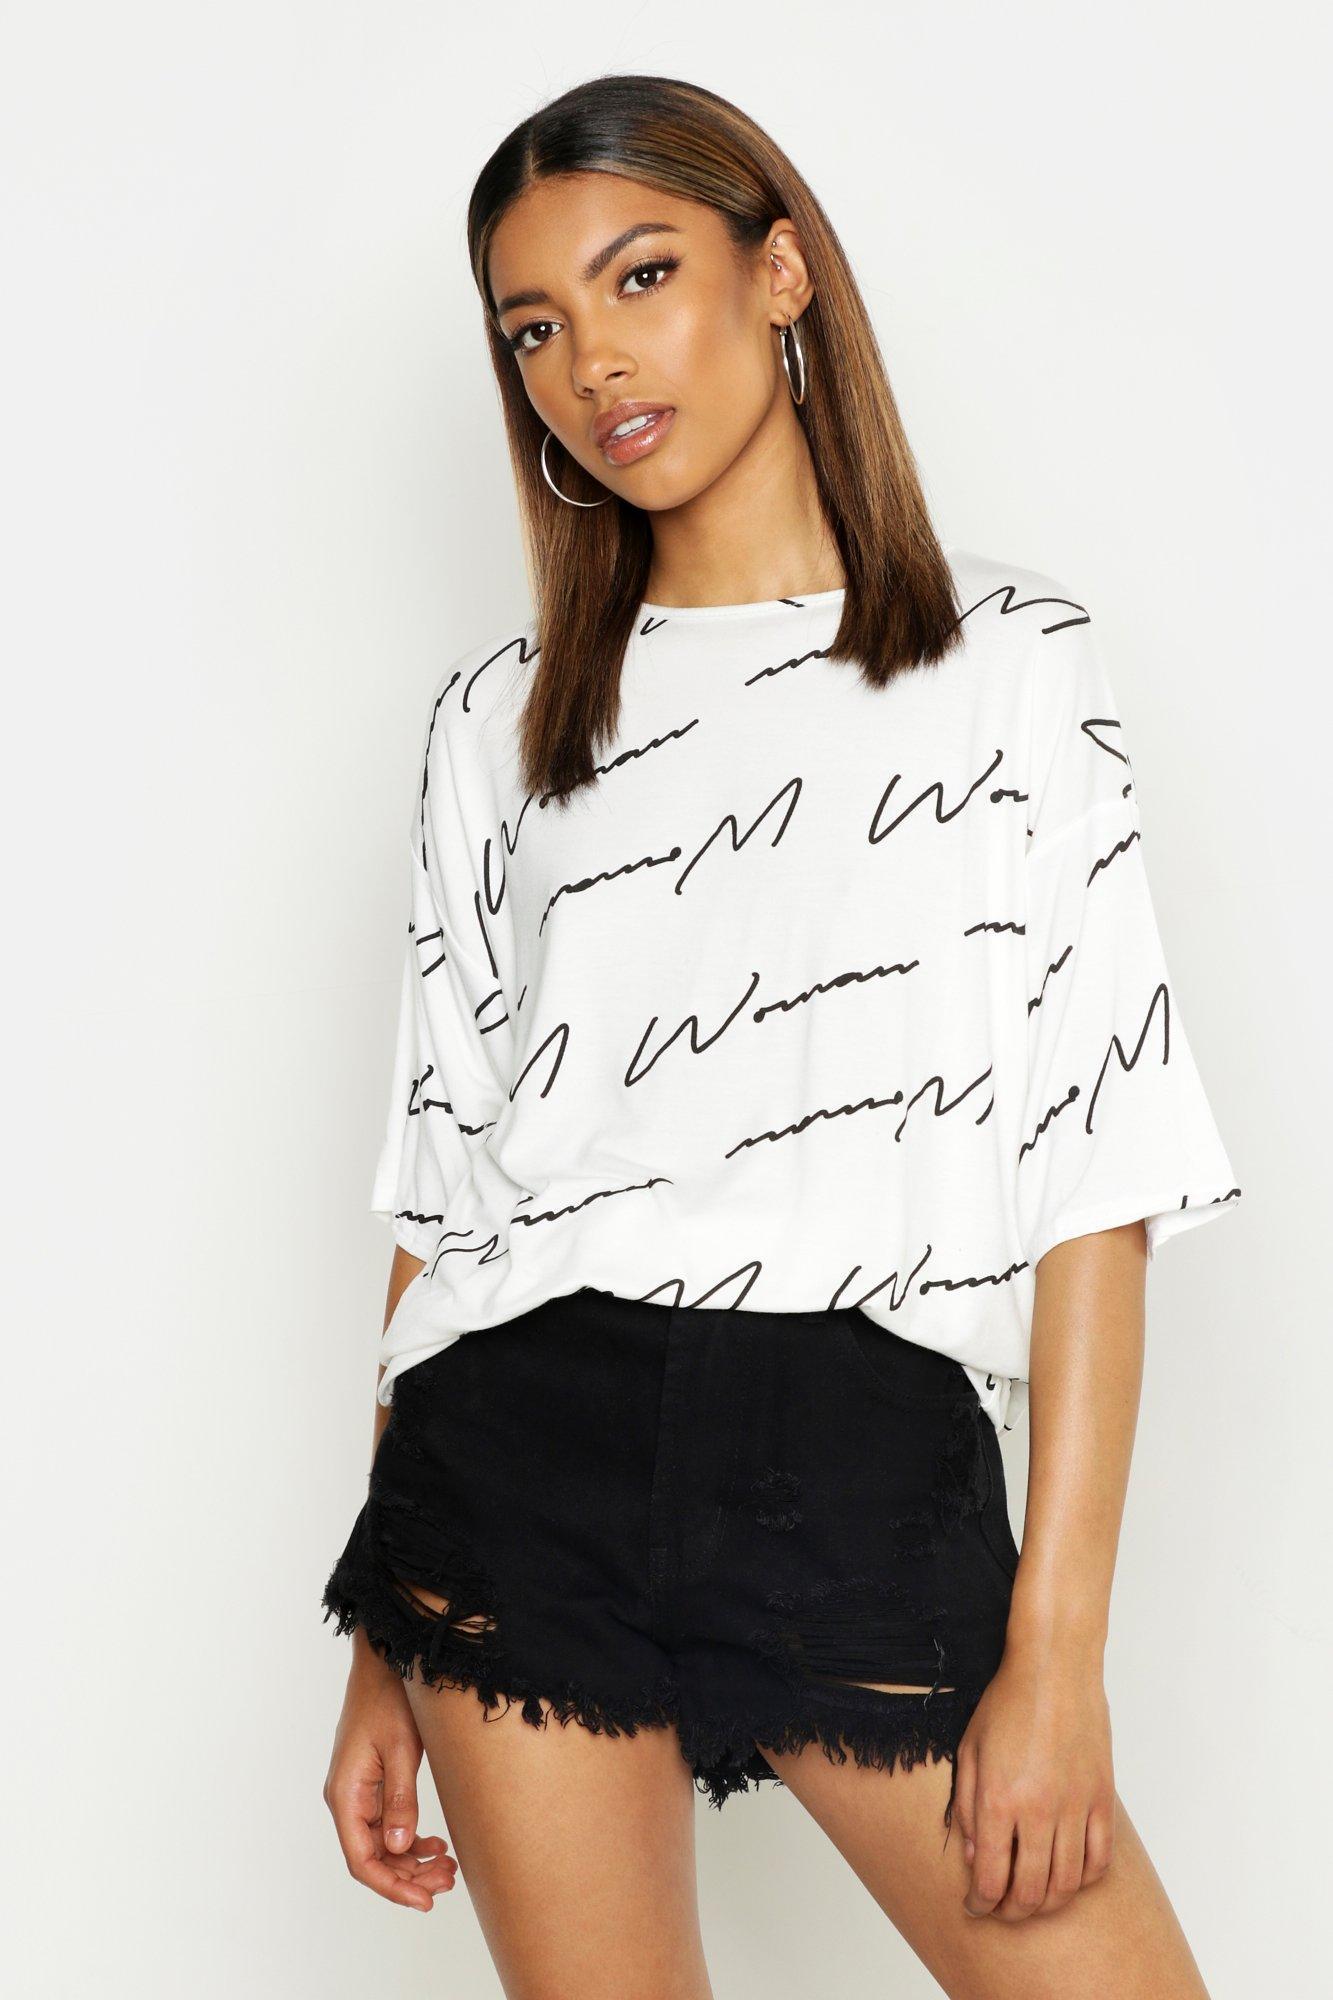 Womens T-Shirt mit Schriftzug Woman - white - 18-20, White - Boohoo.com